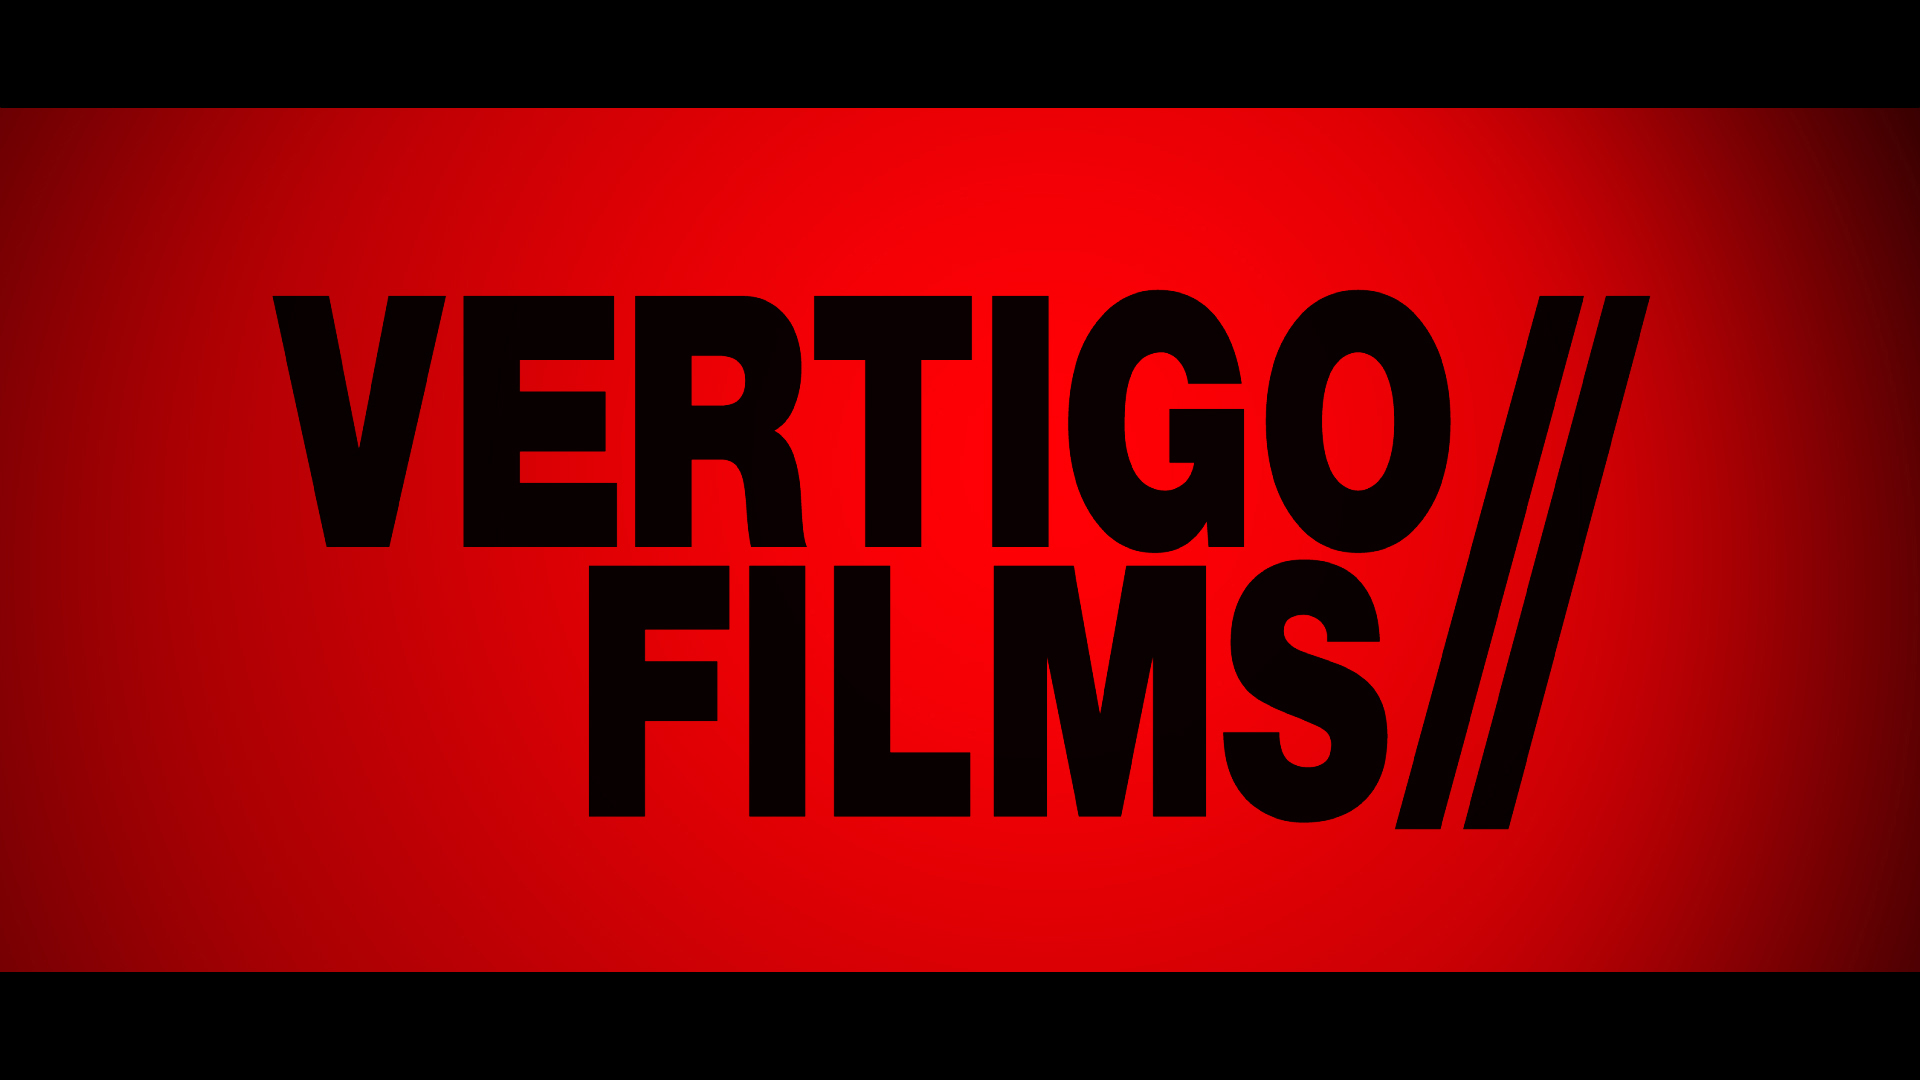 Batman Animated Wallpaper Vertigo Films Logo Wallpaper 62550